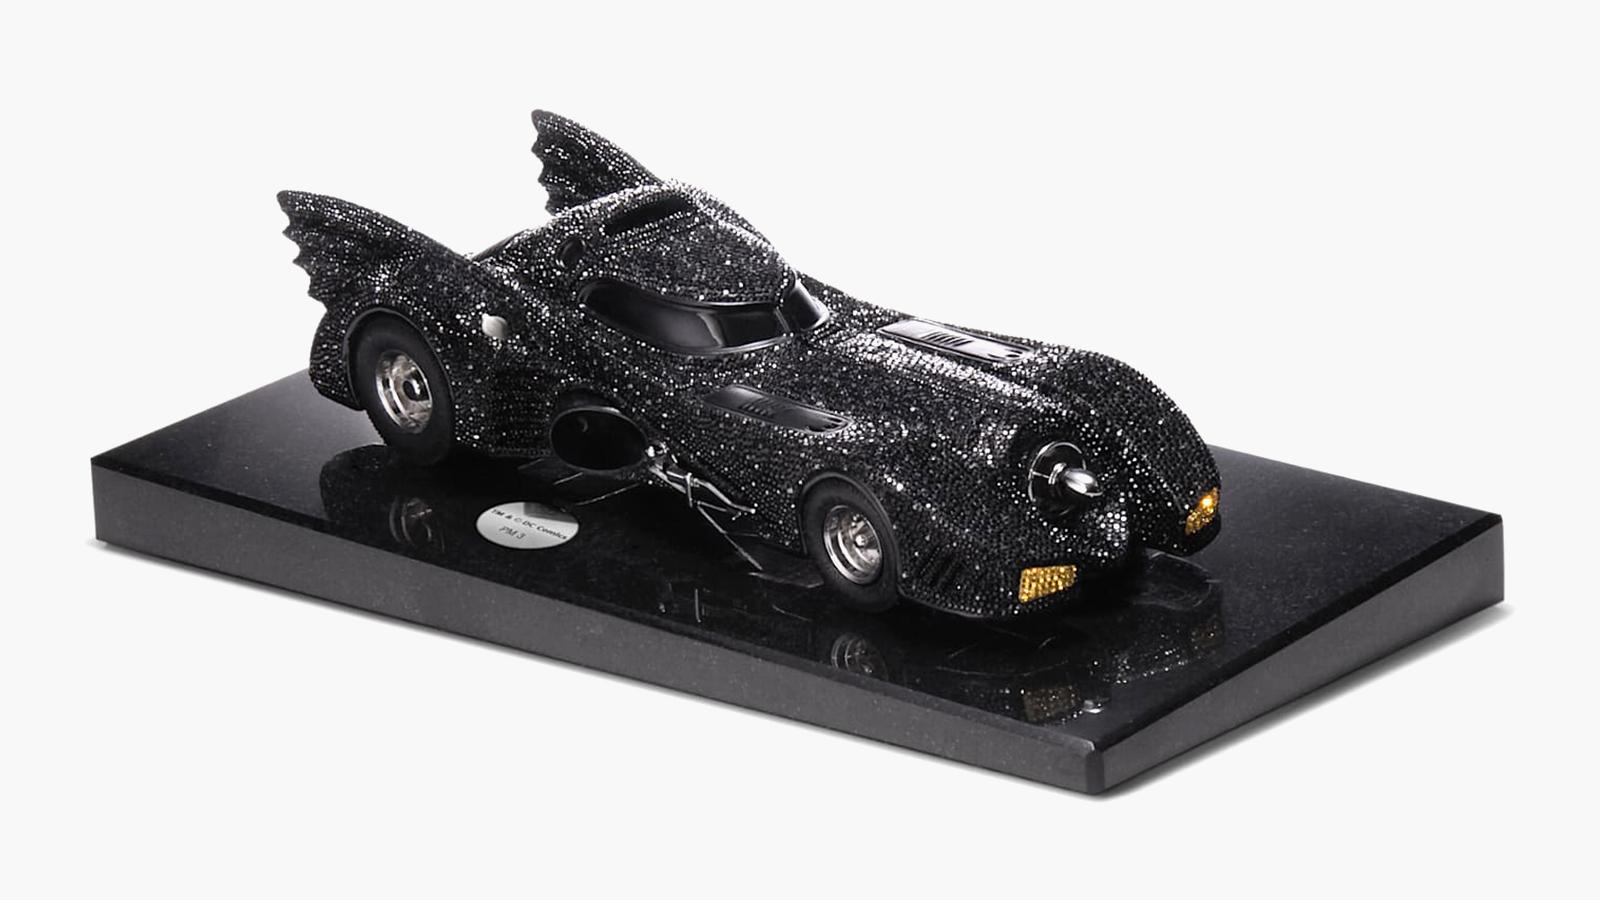 Swarovski Batmobile Limited Edition